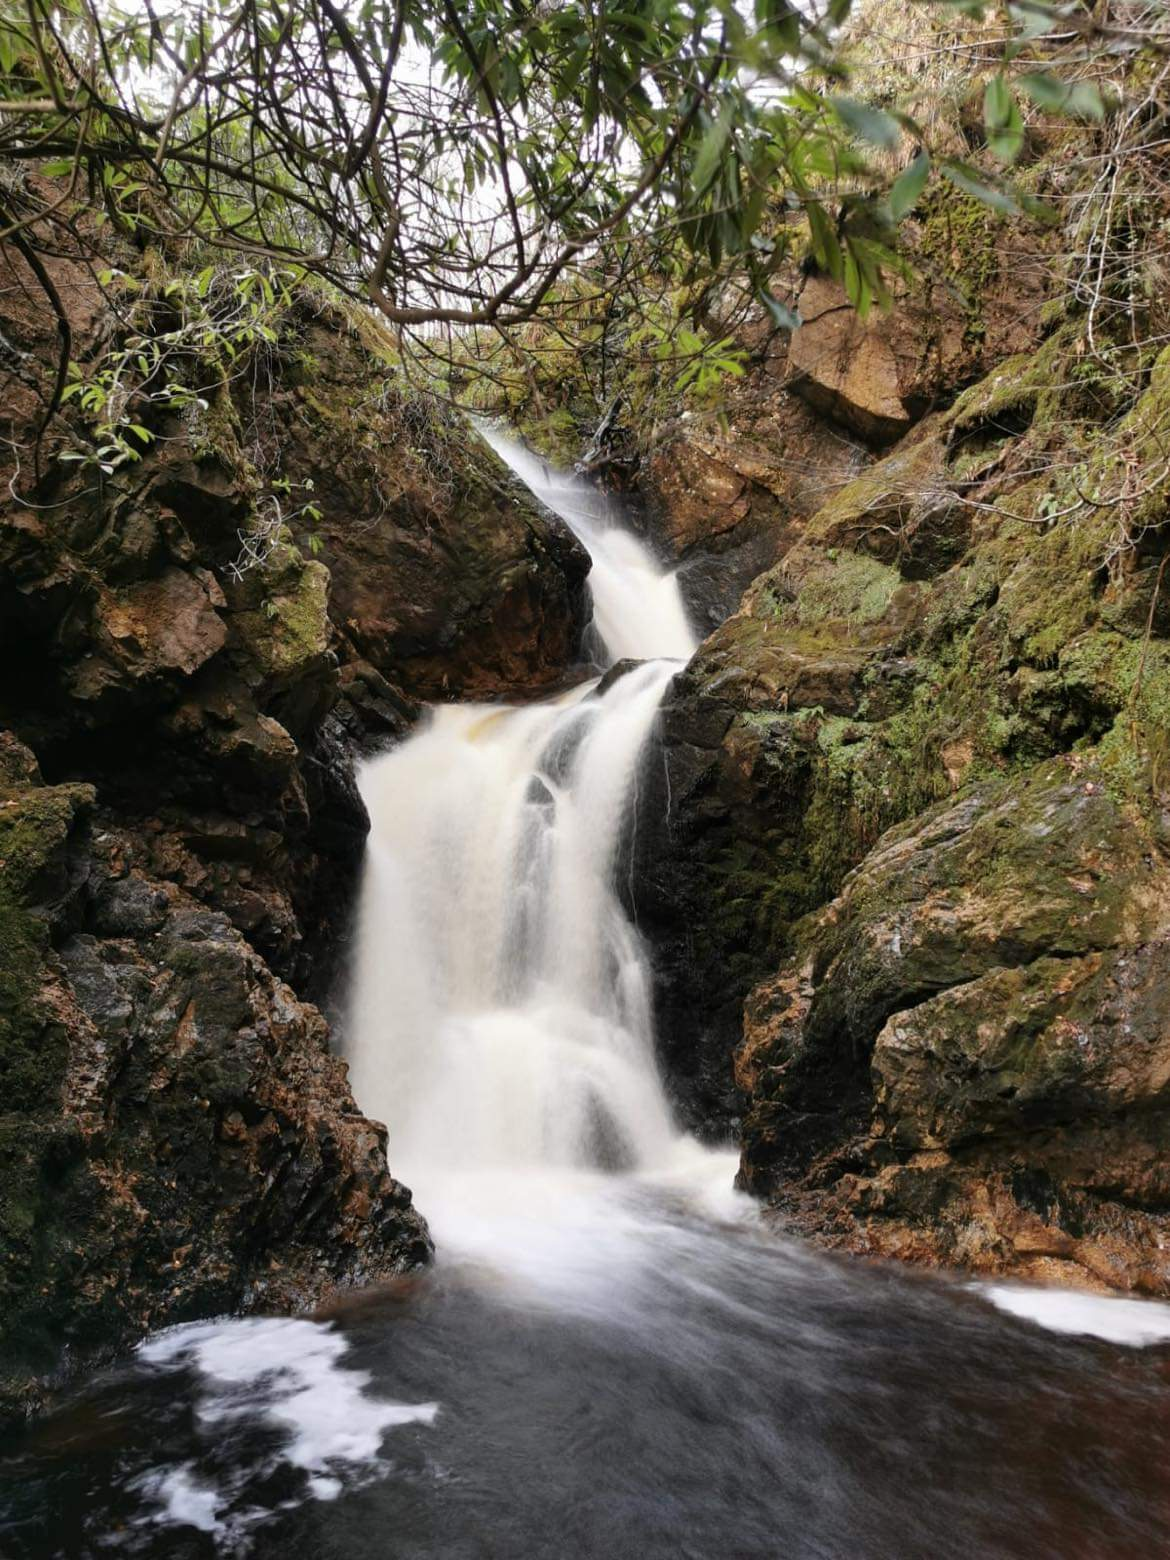 Large waterfall at big burn gorge